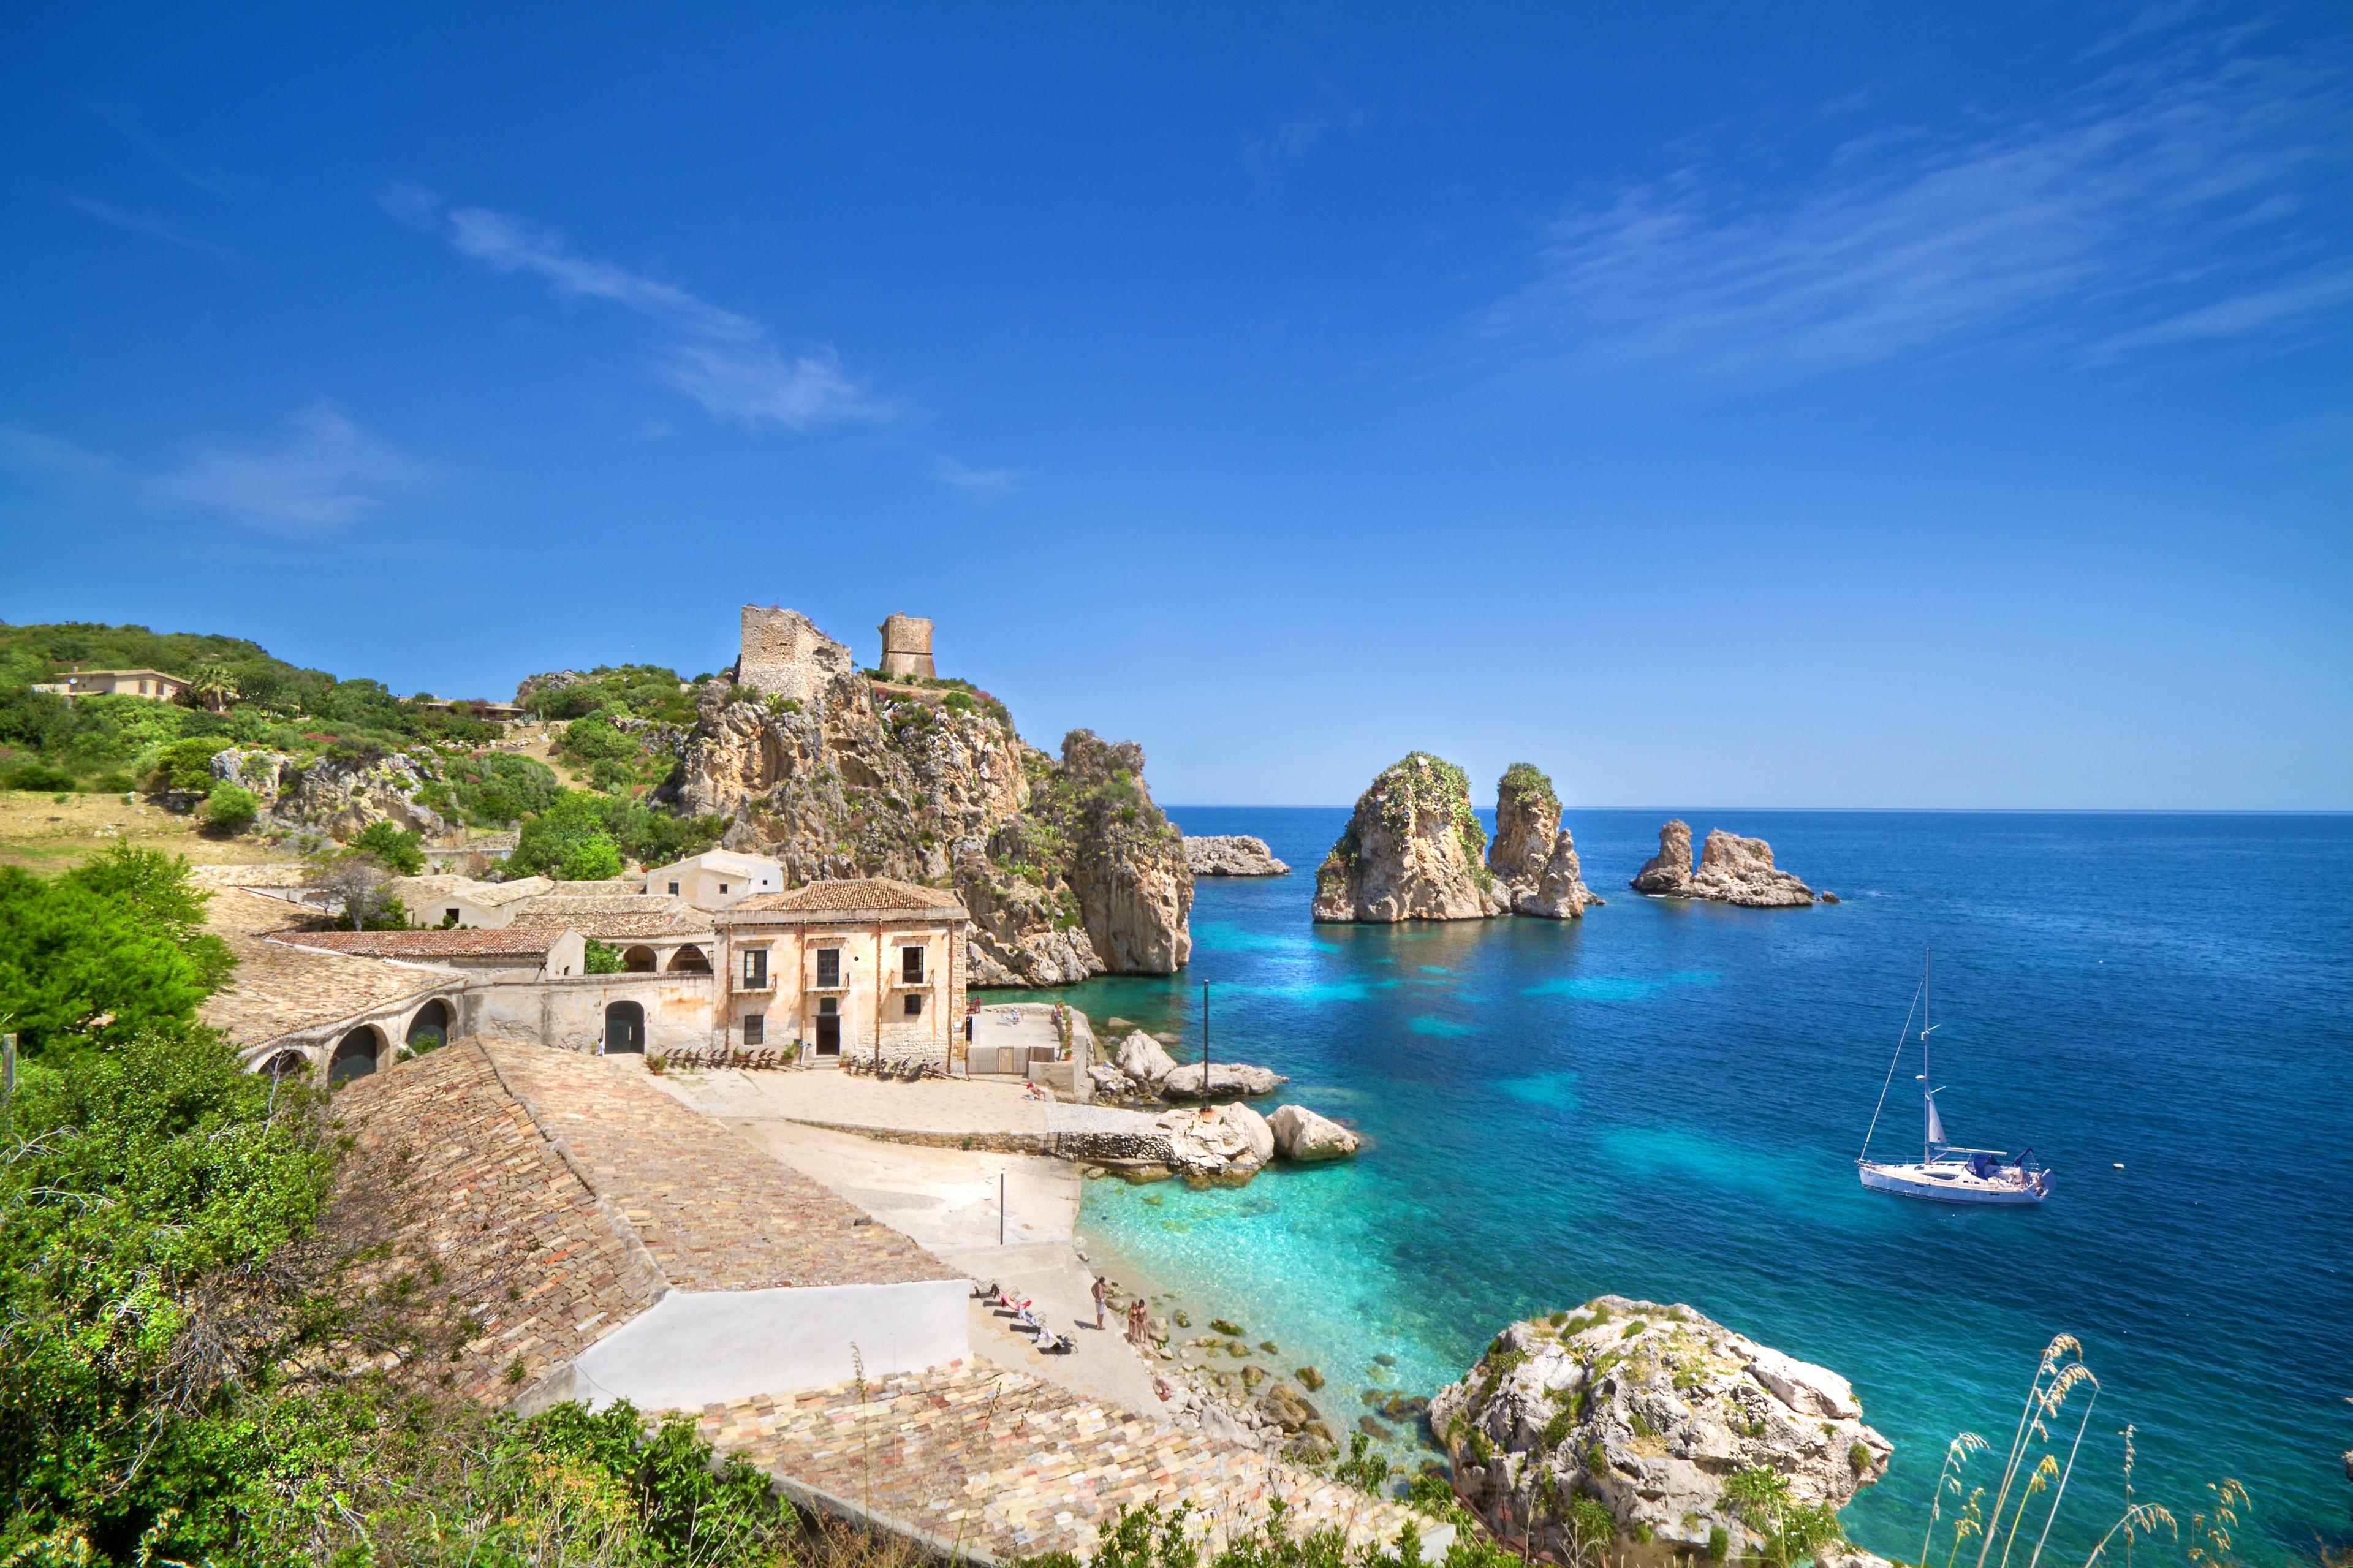 Tonnara of Scopello, Castellammare del Golfo, Sicily, Italy